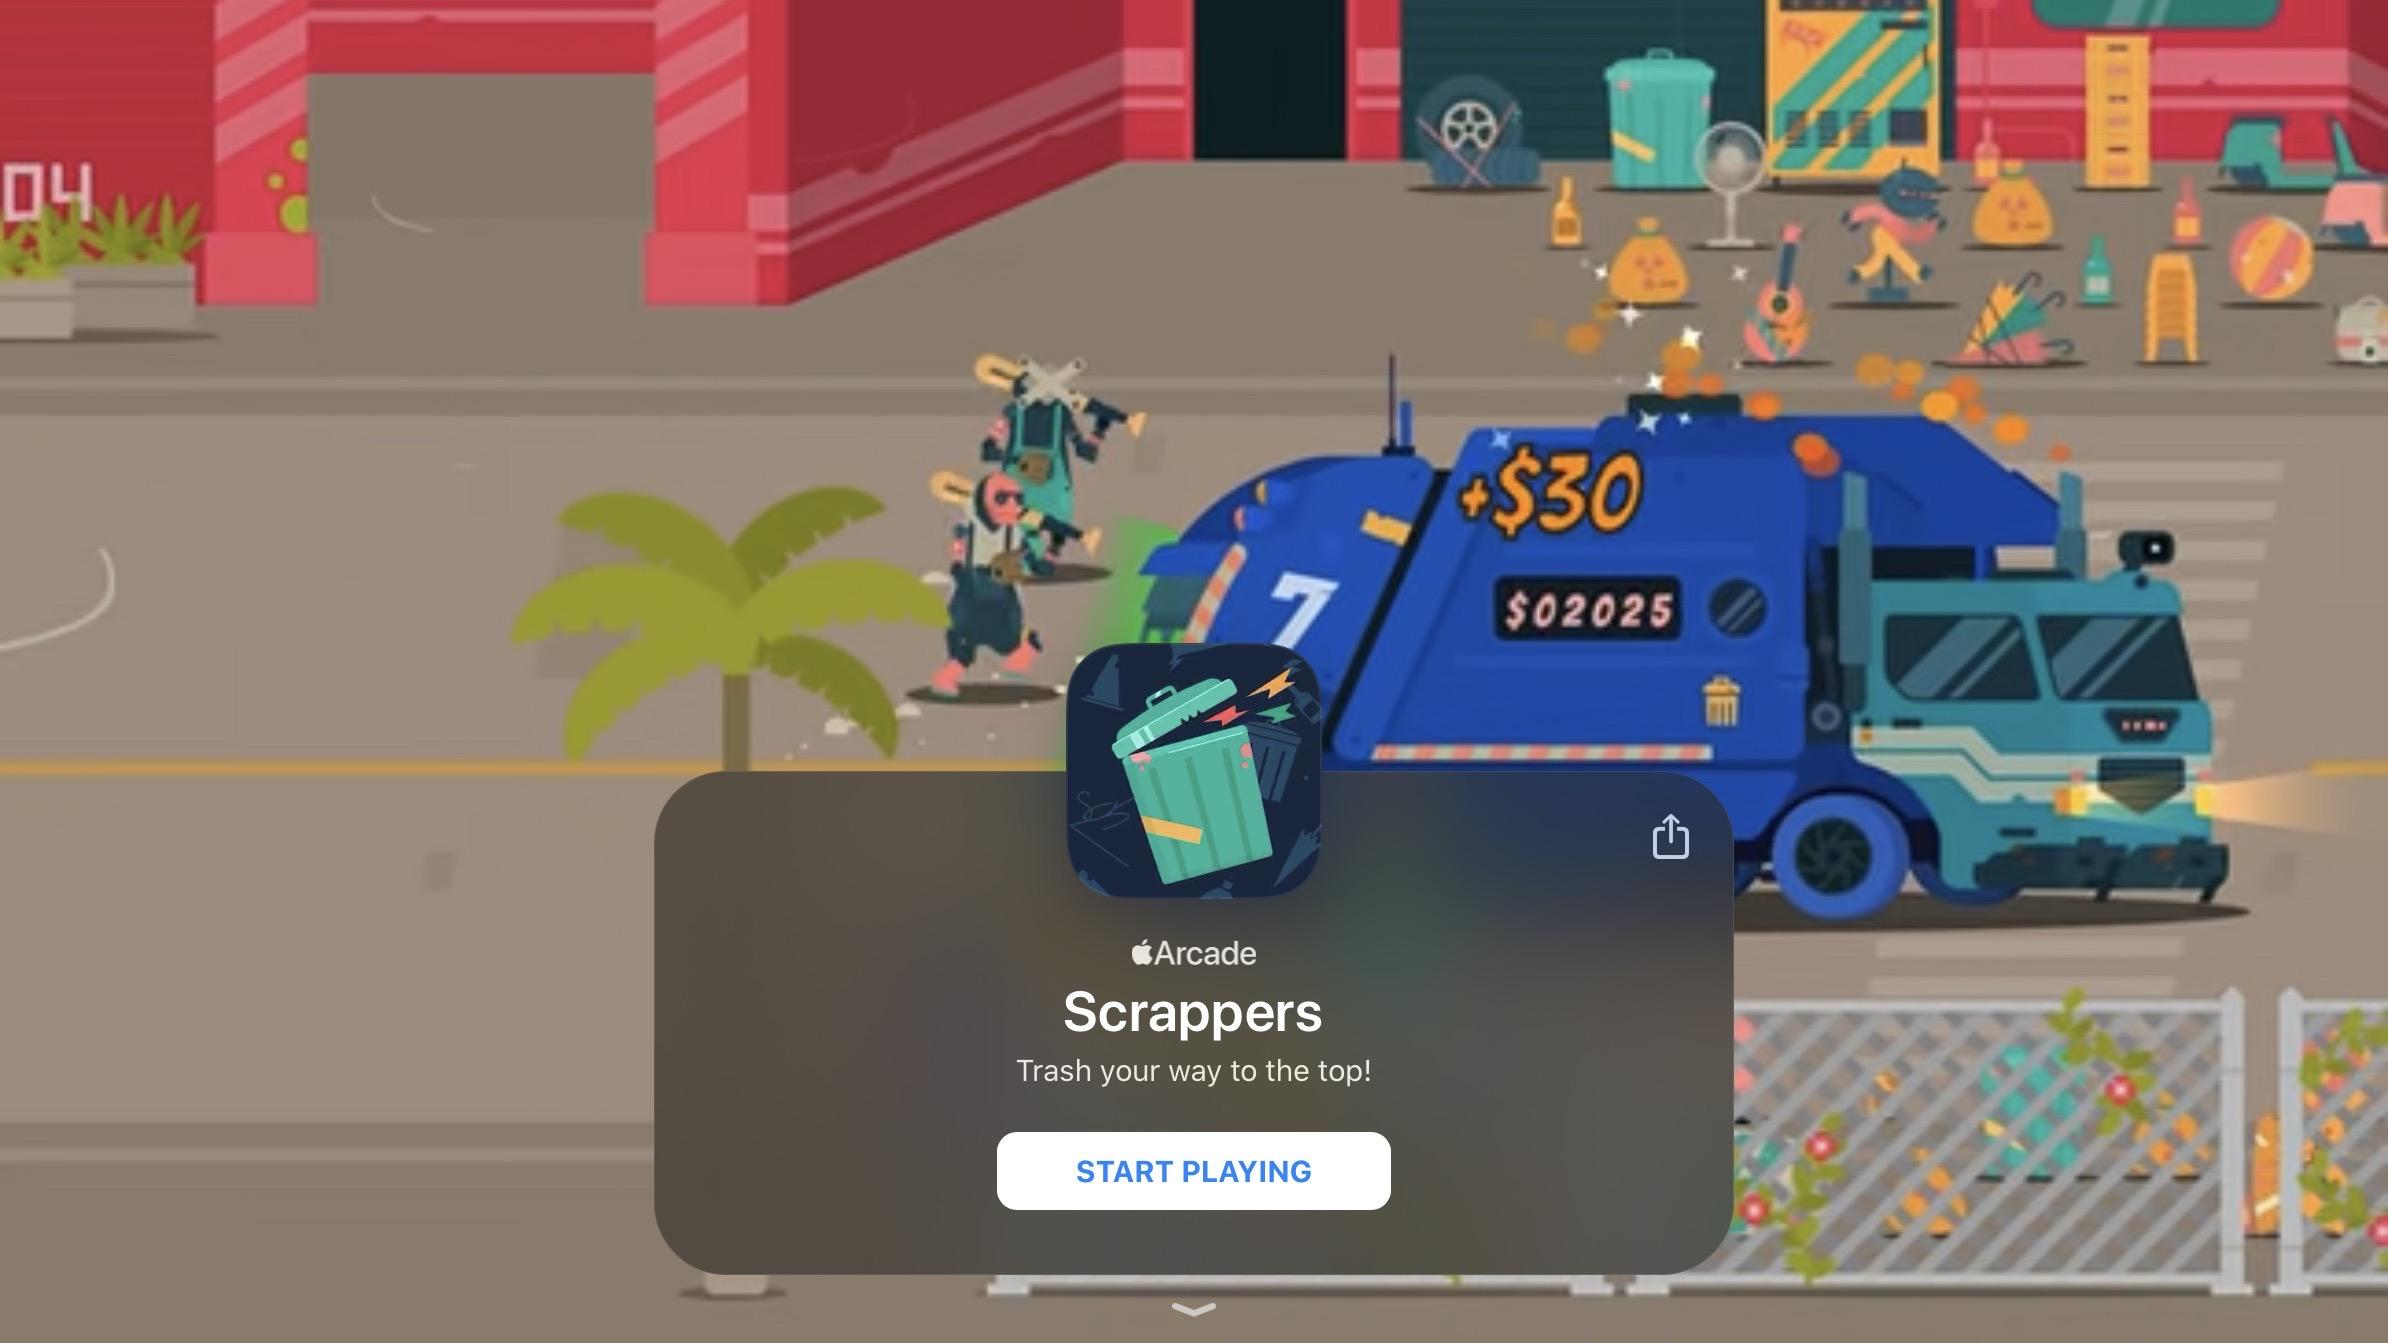 Apple Arcade novo jogo 4/10 Scrappers